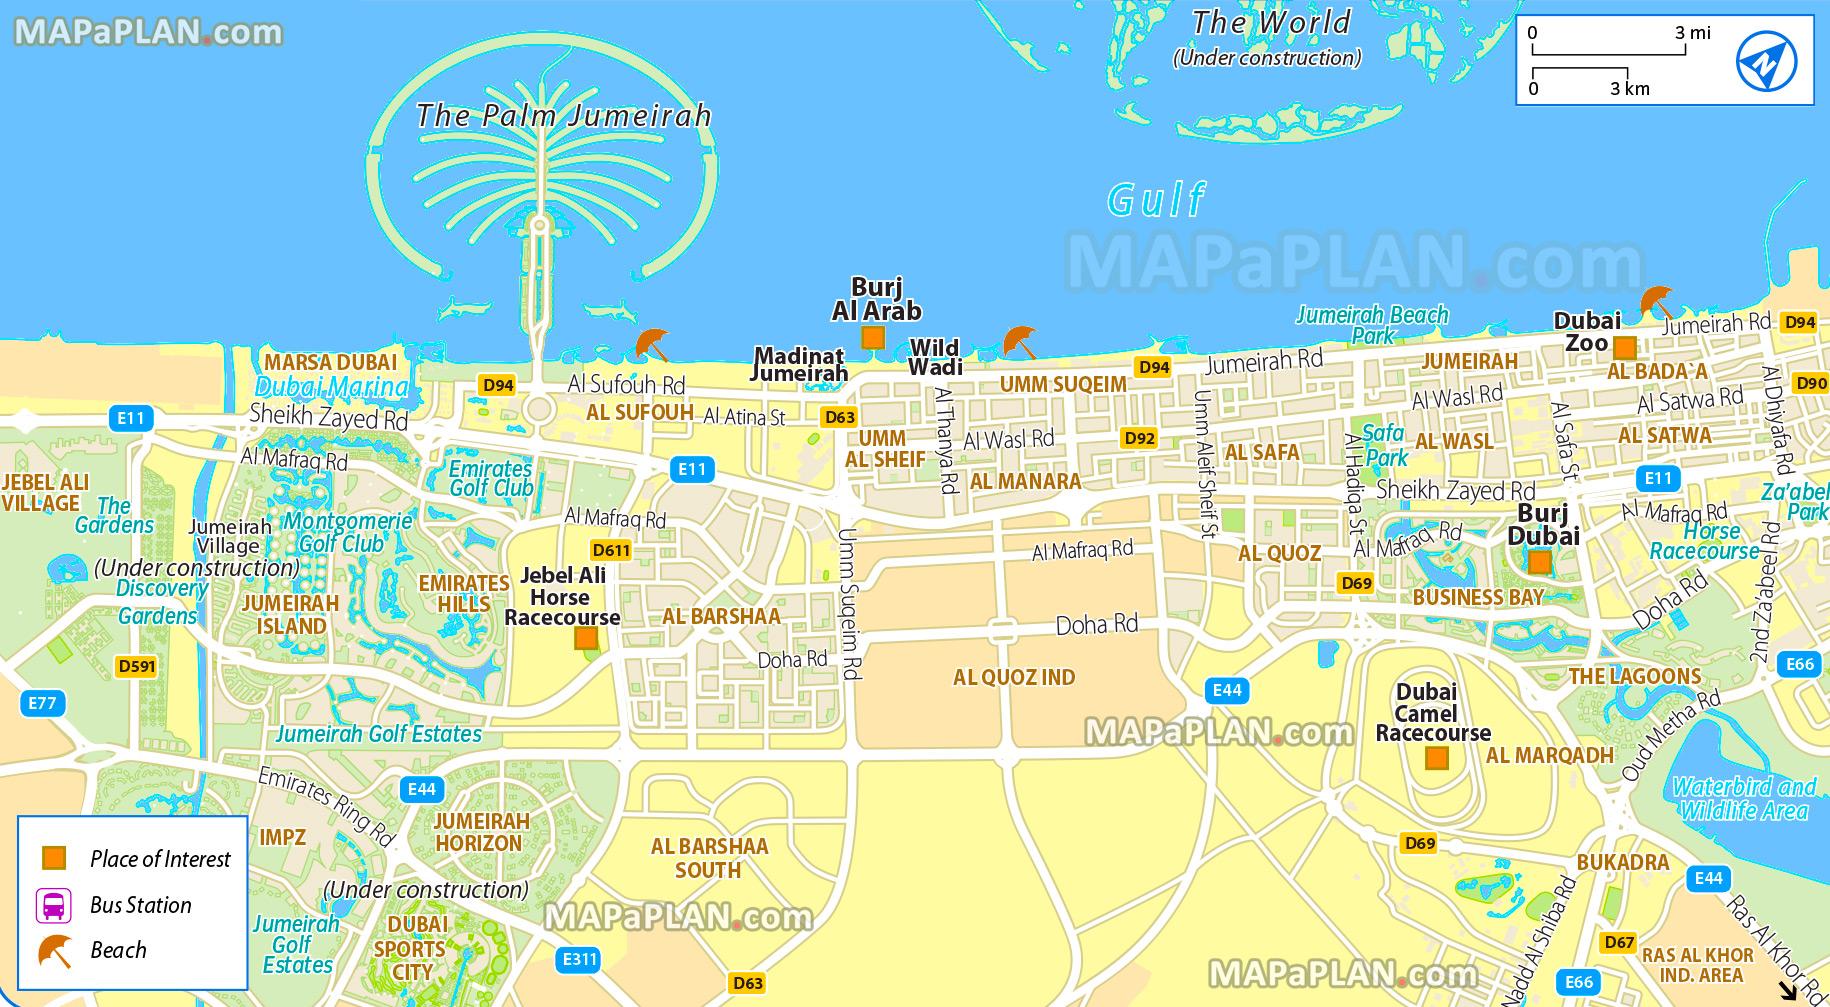 London Map Attractions Pdf.Dubai Tourist Attractions Map Pdf Tourism Company And Tourism